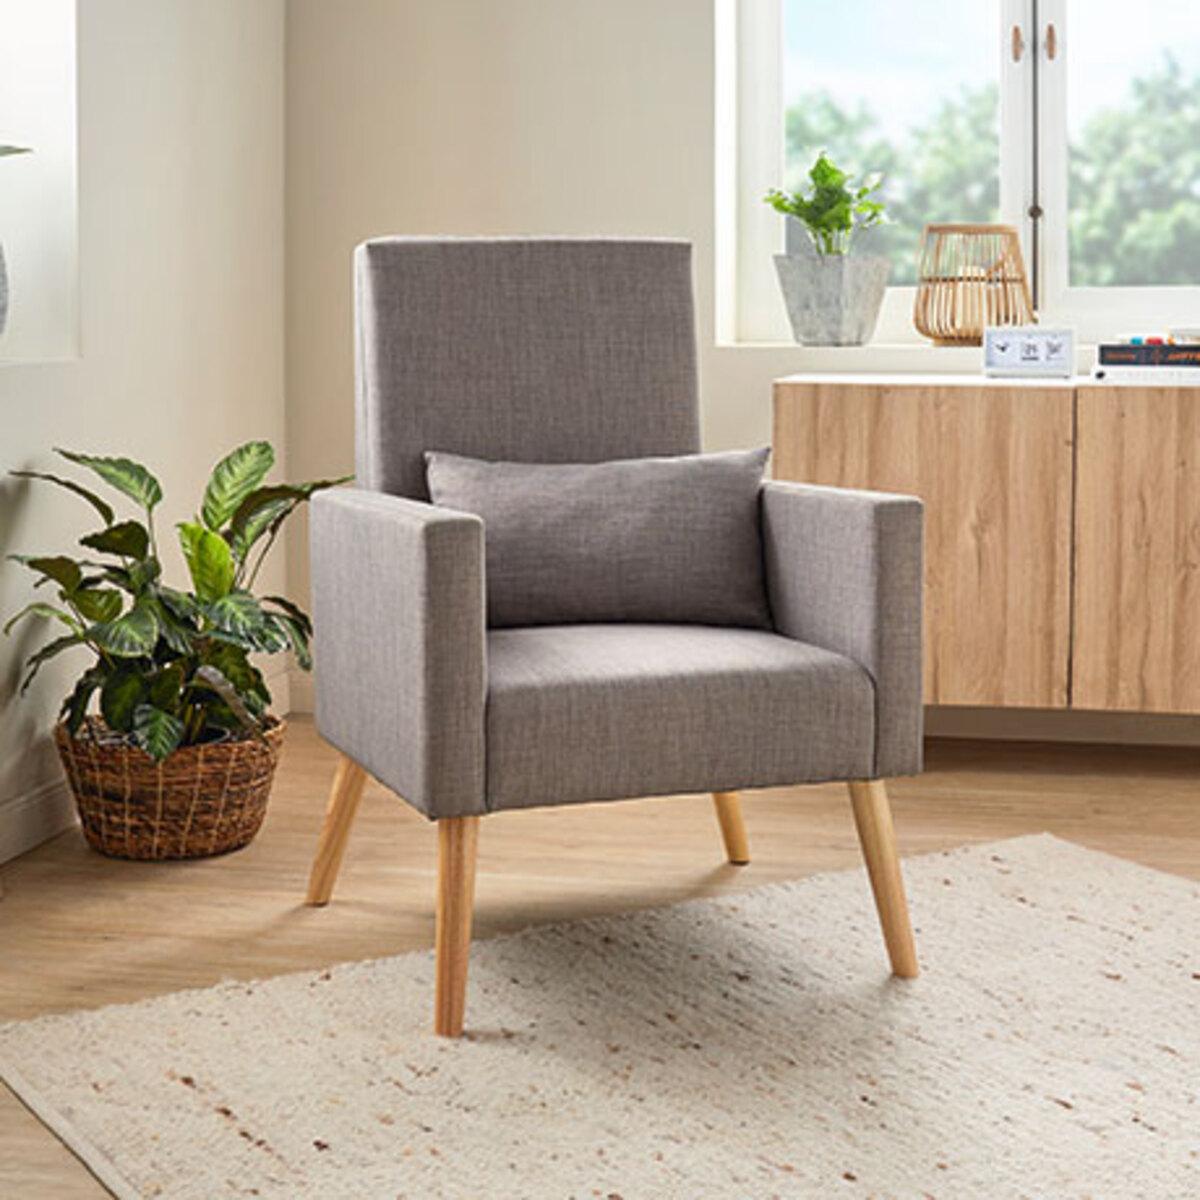 Bild 2 von 2-in-1 Schaukelstuhl-Sessel inkl. Zierkissen1